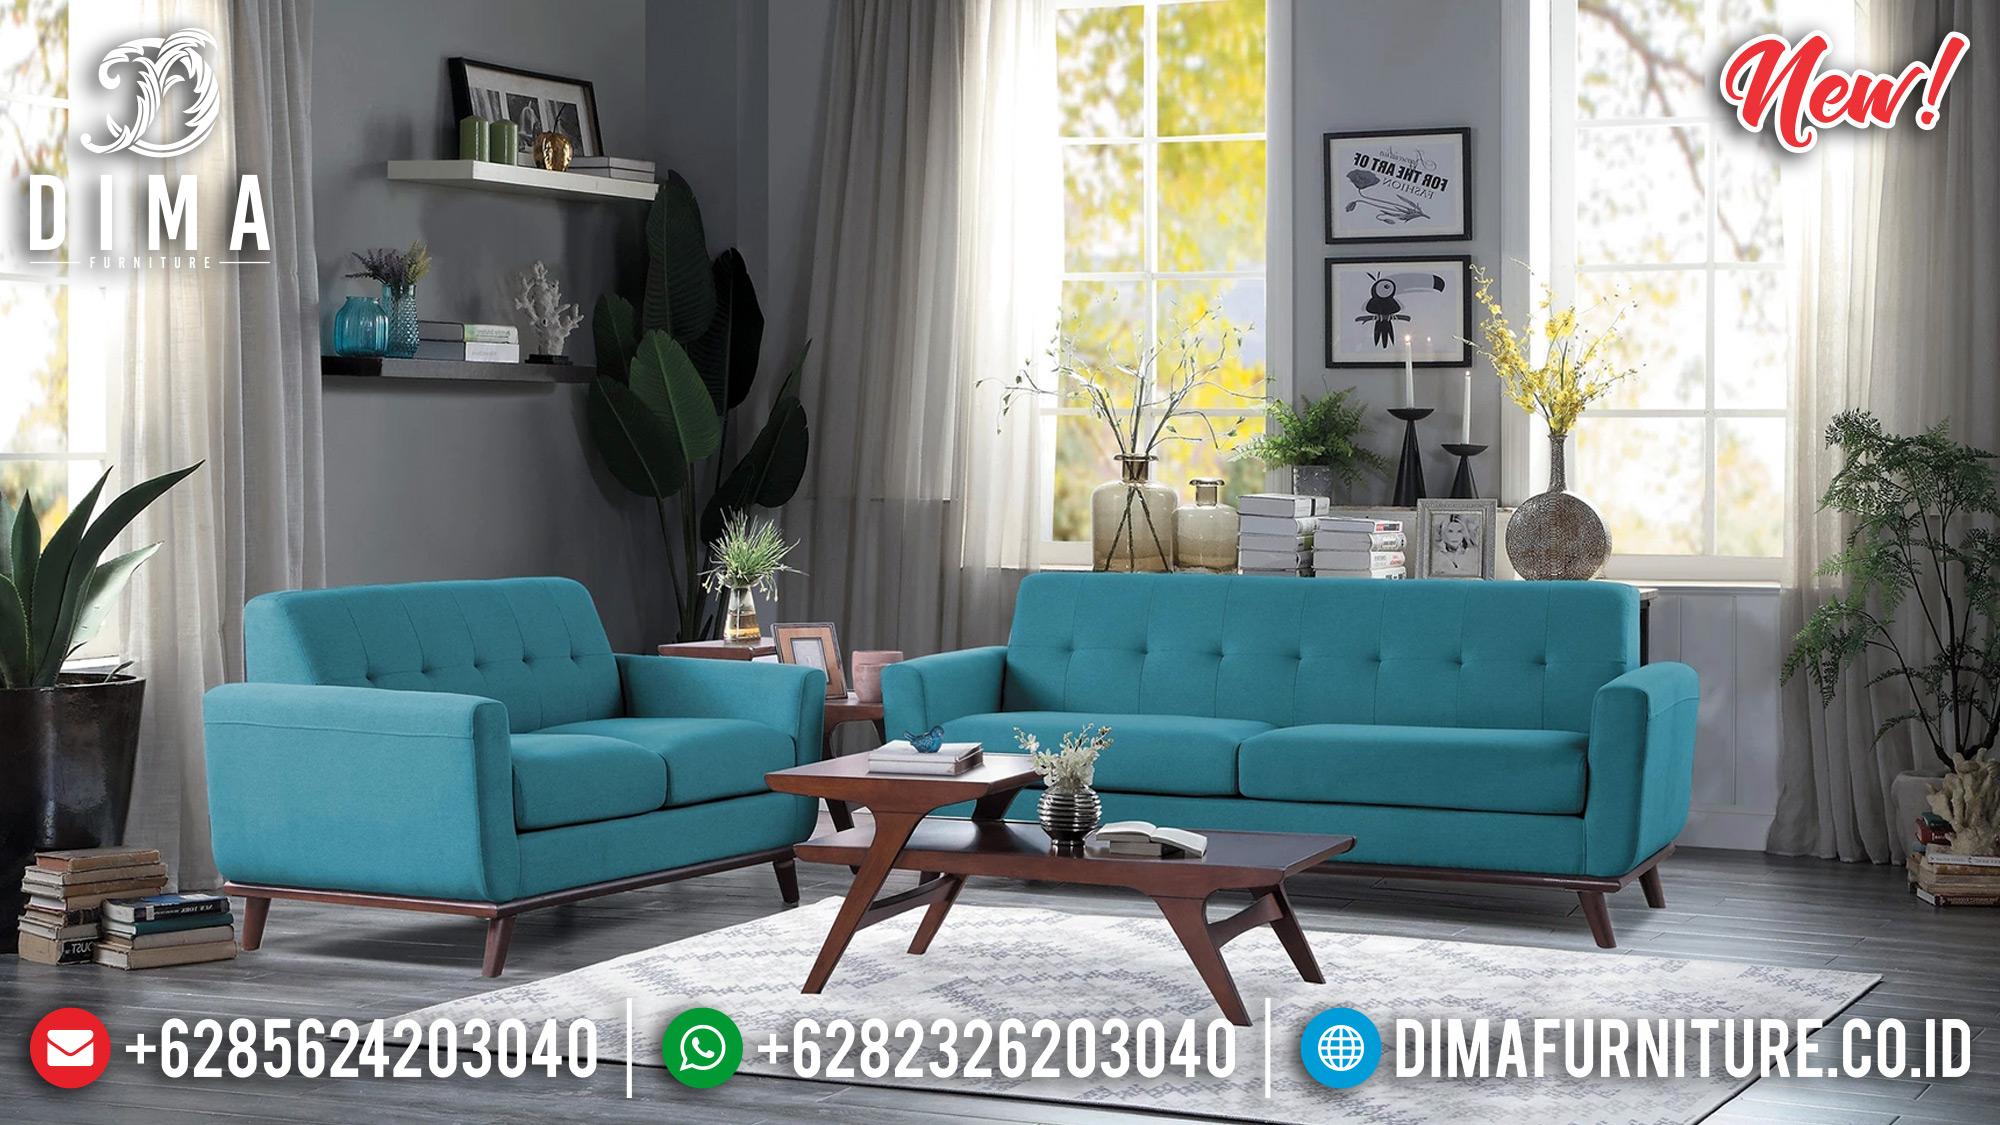 Jual Sofa Tamu Jepara Set 3 2 1 Turquoise BT-0182